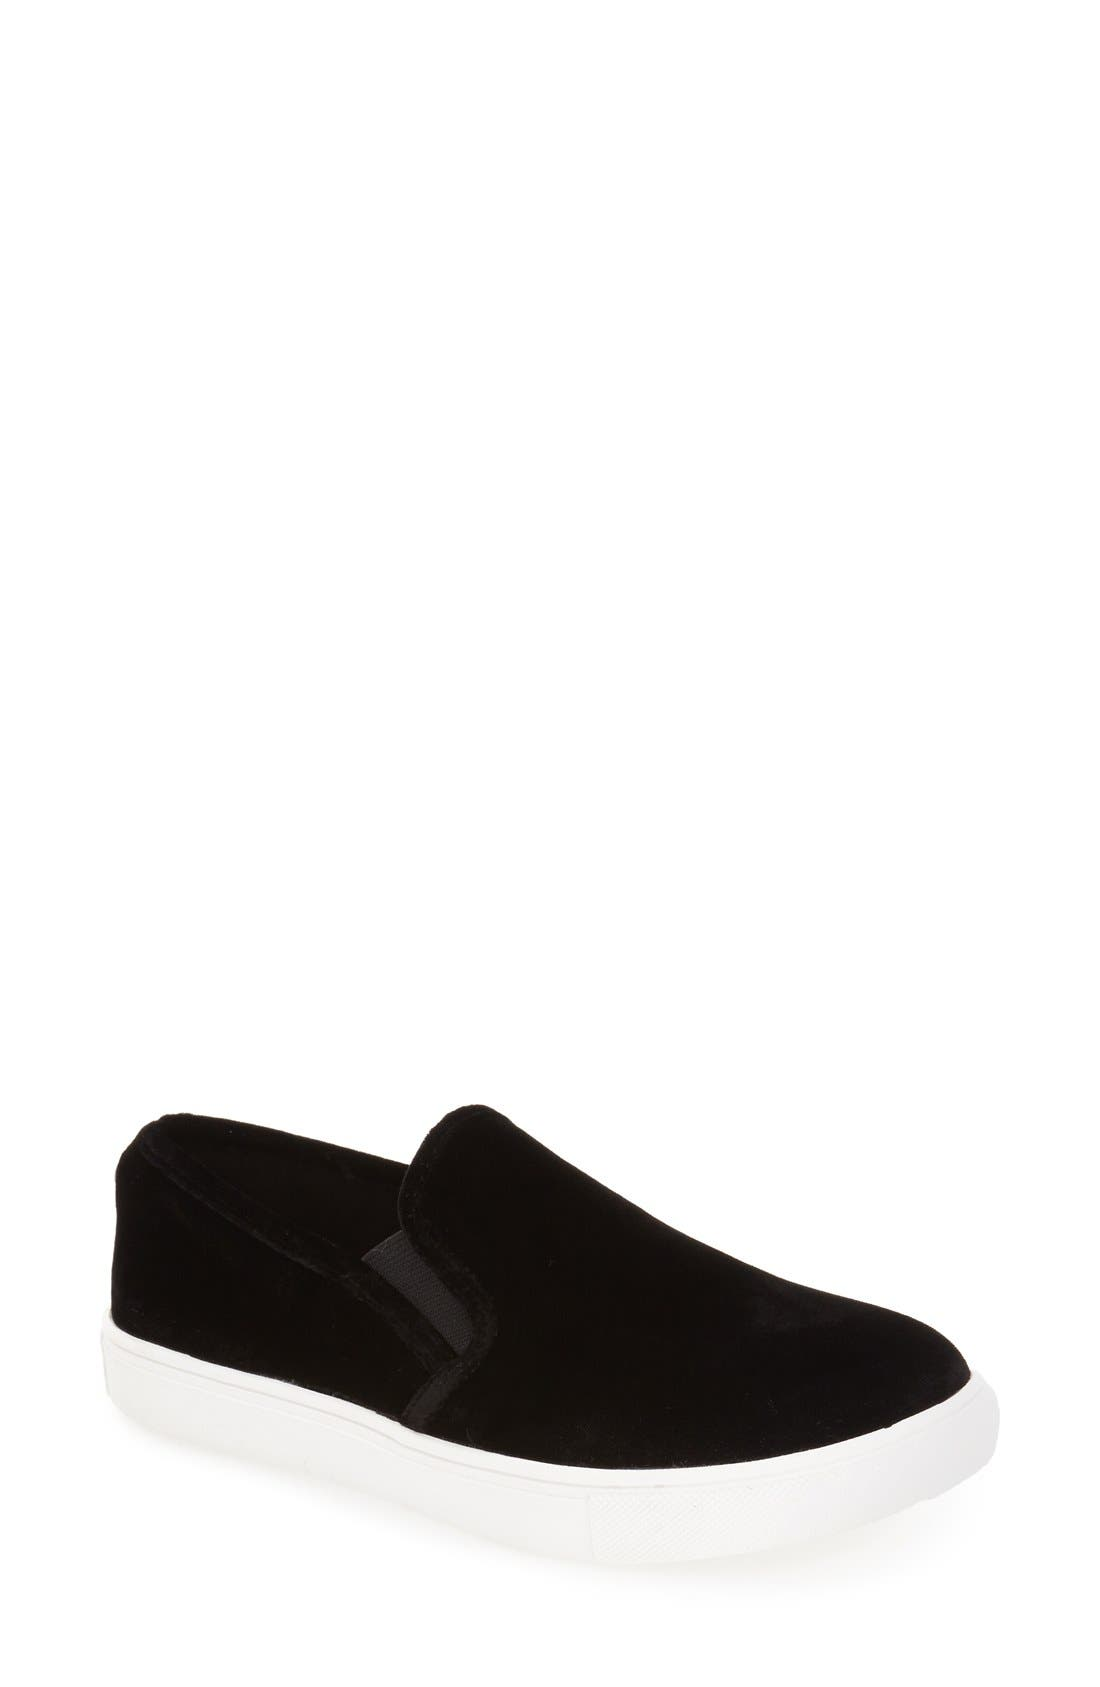 Ecntrcv Slip-On Sneaker,                             Main thumbnail 4, color,